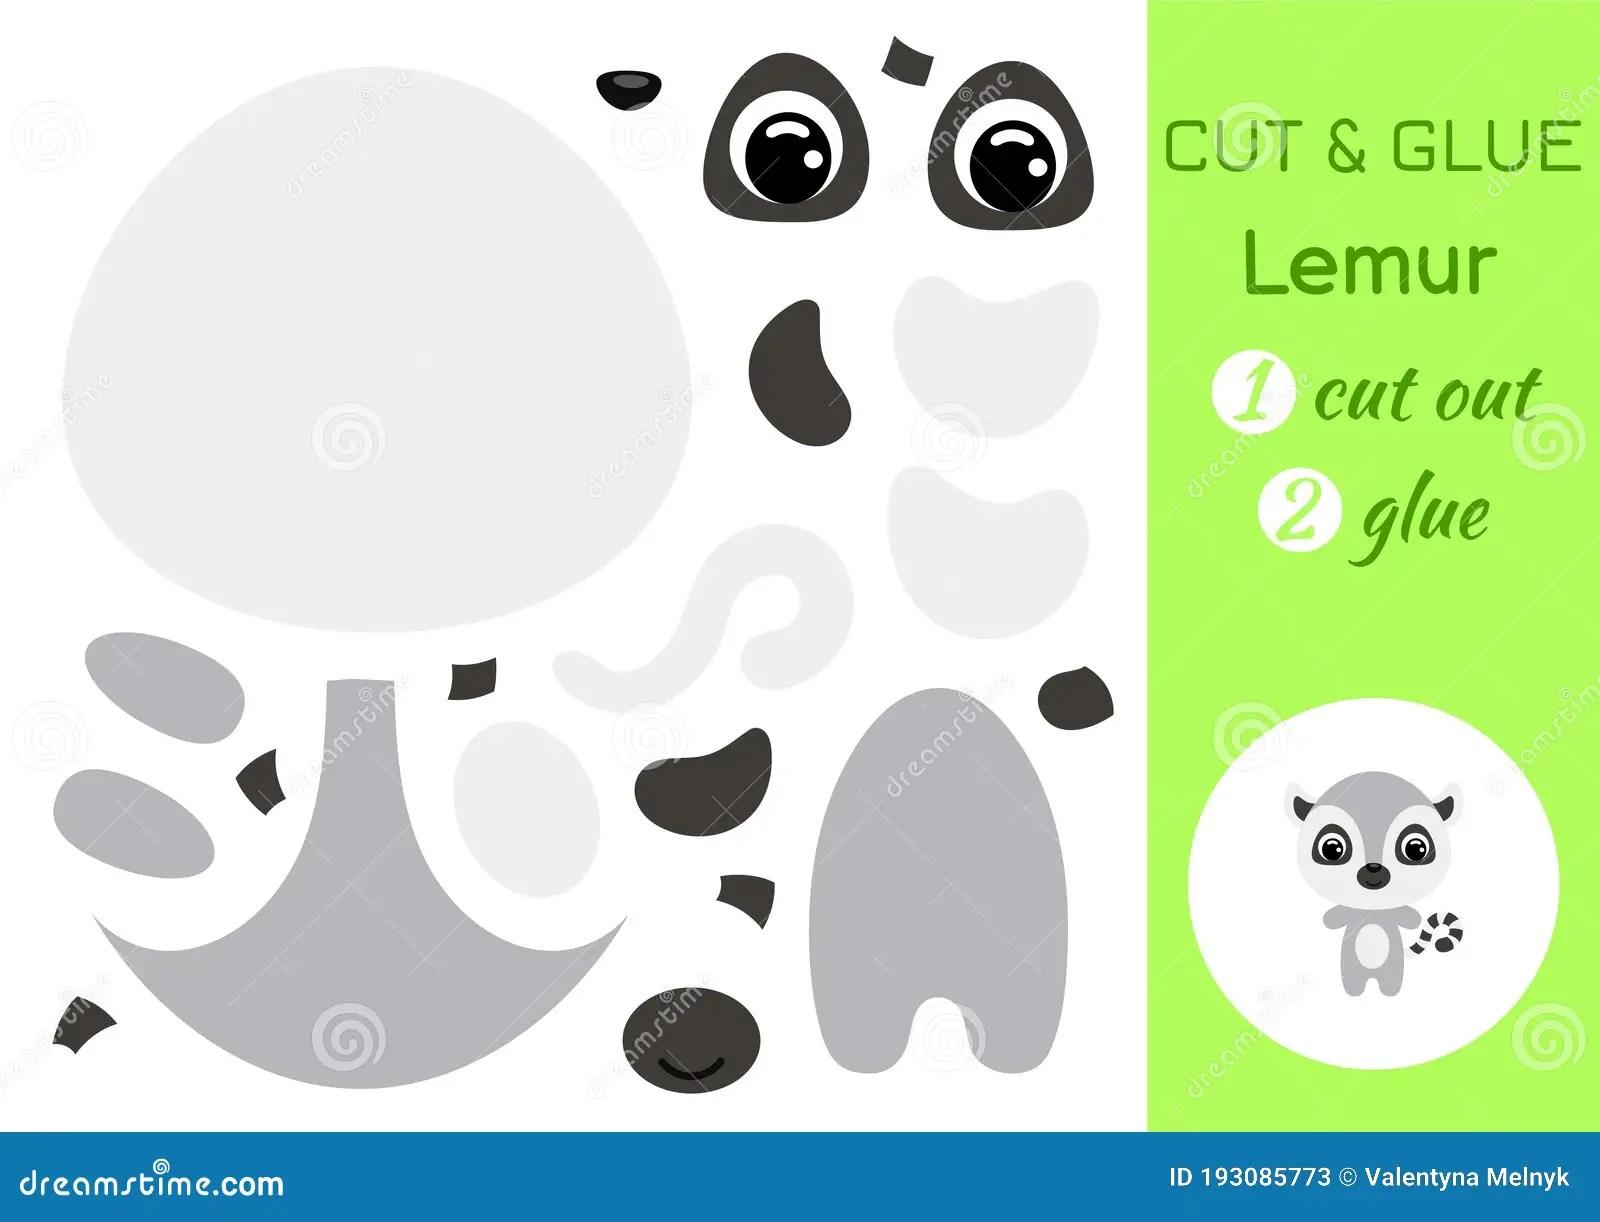 Cut And Glue Baby Lemur Education Developing Worksheet